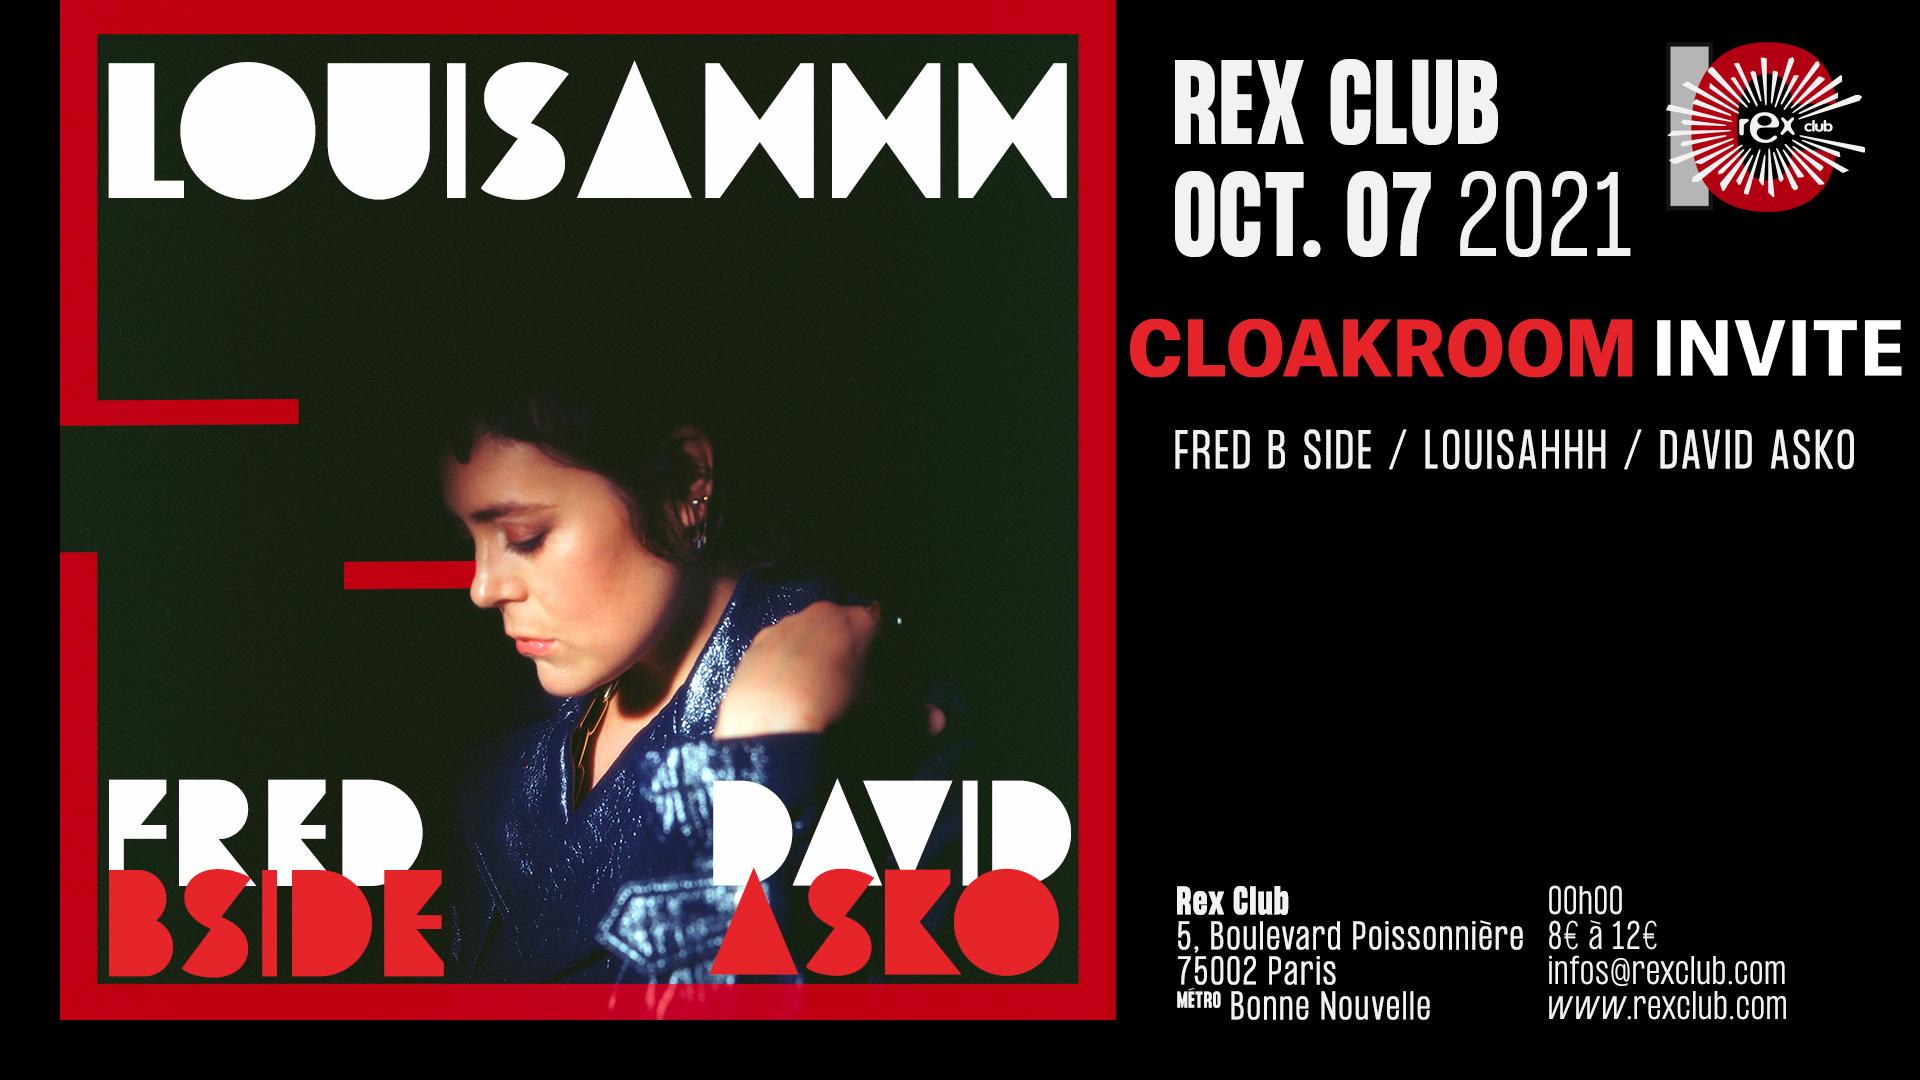 Cloakroom Invite : Louisahhh, Fred Bside, David Asko